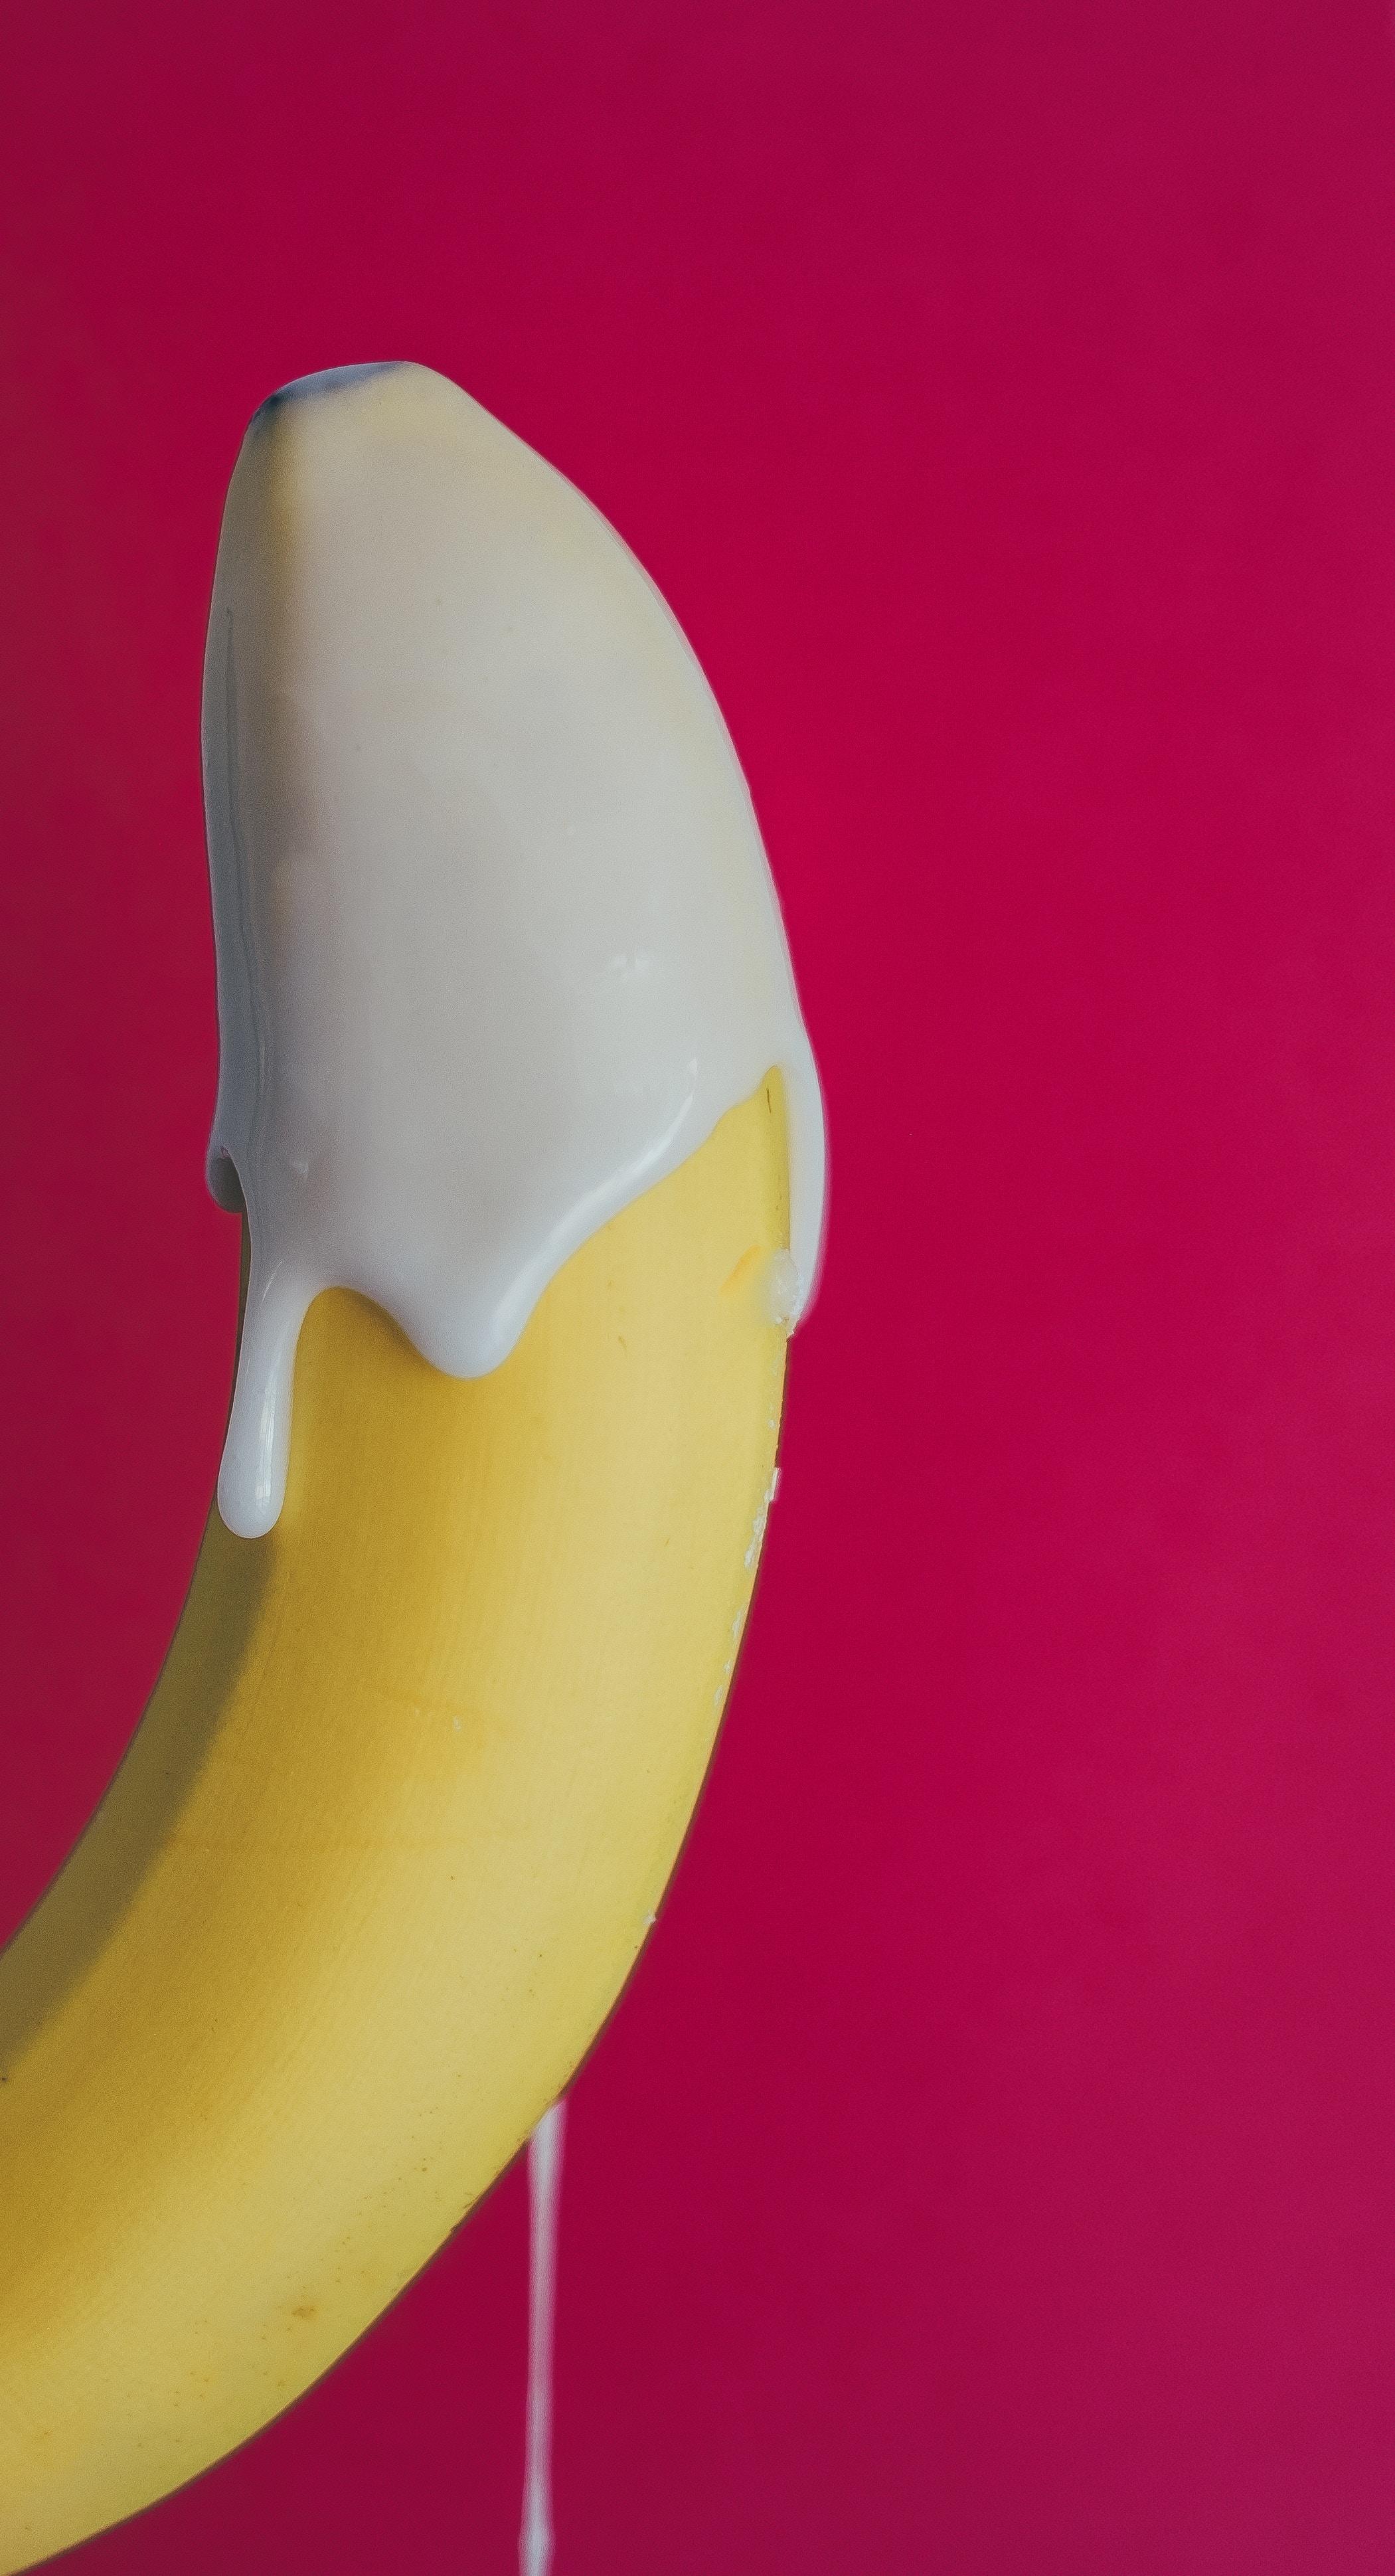 OliviaOwen_banana.jpg